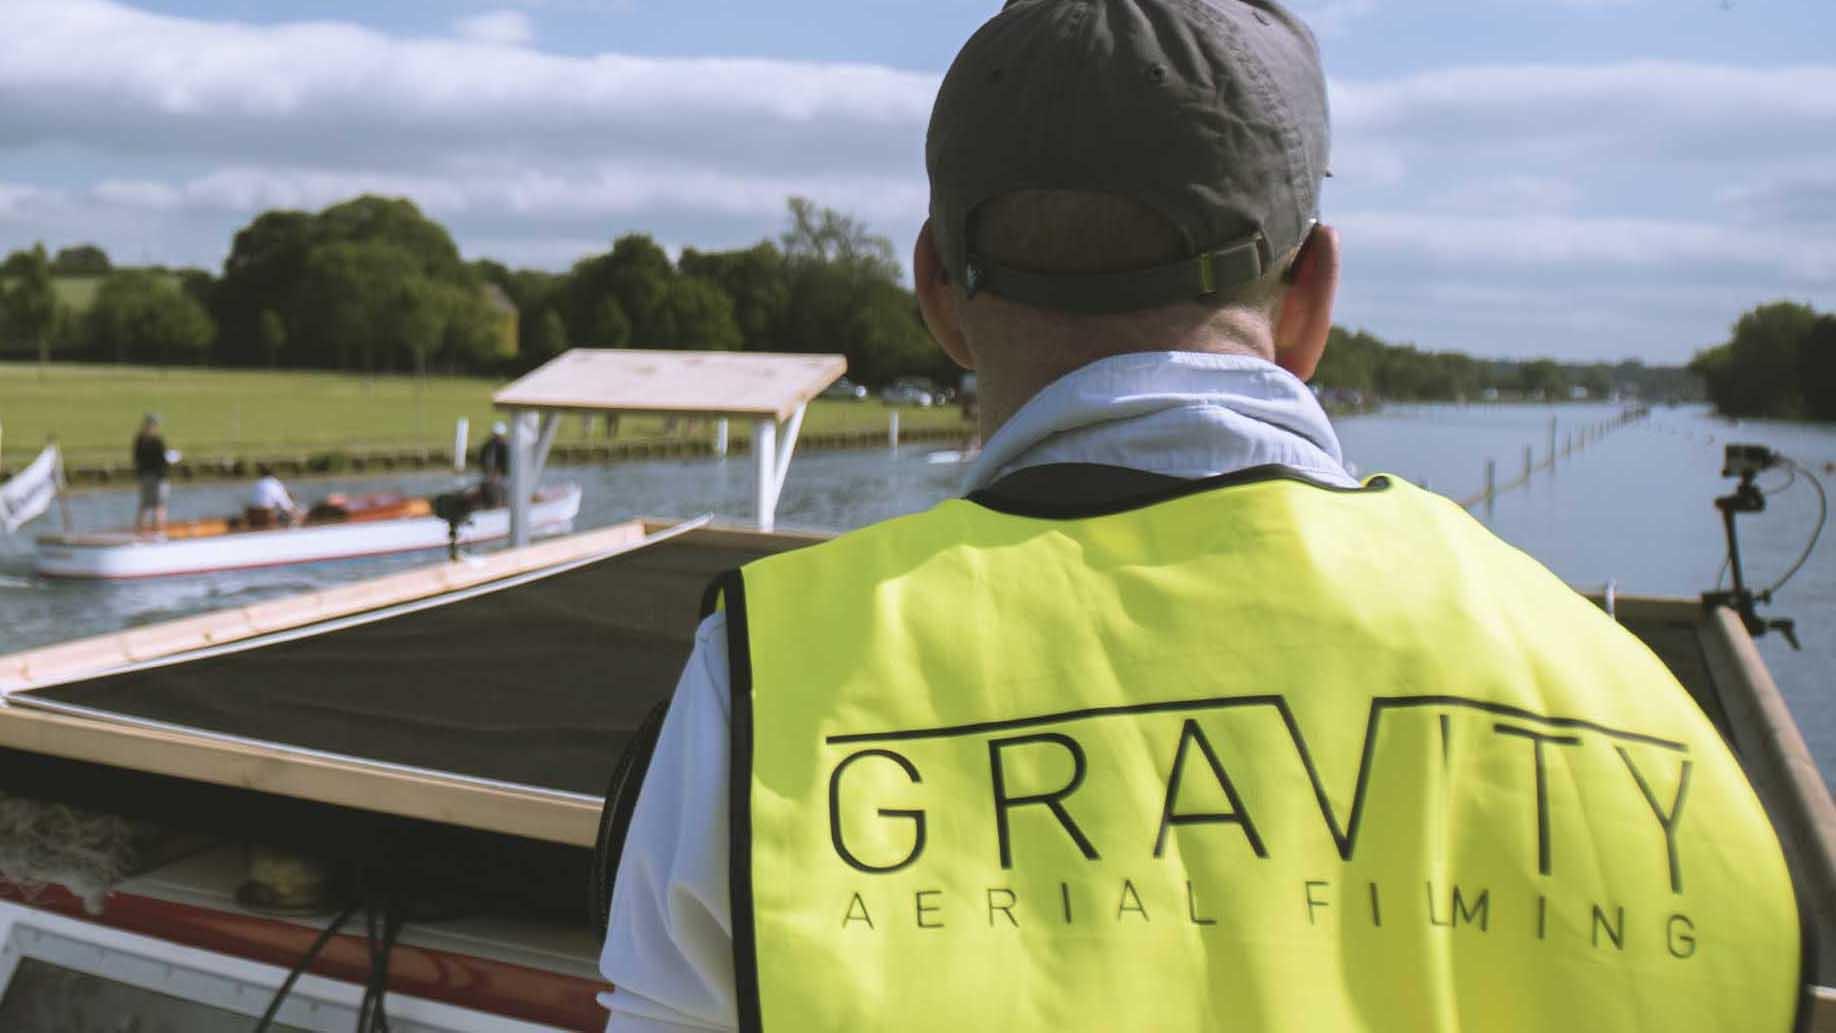 Gravityfilming_HWR